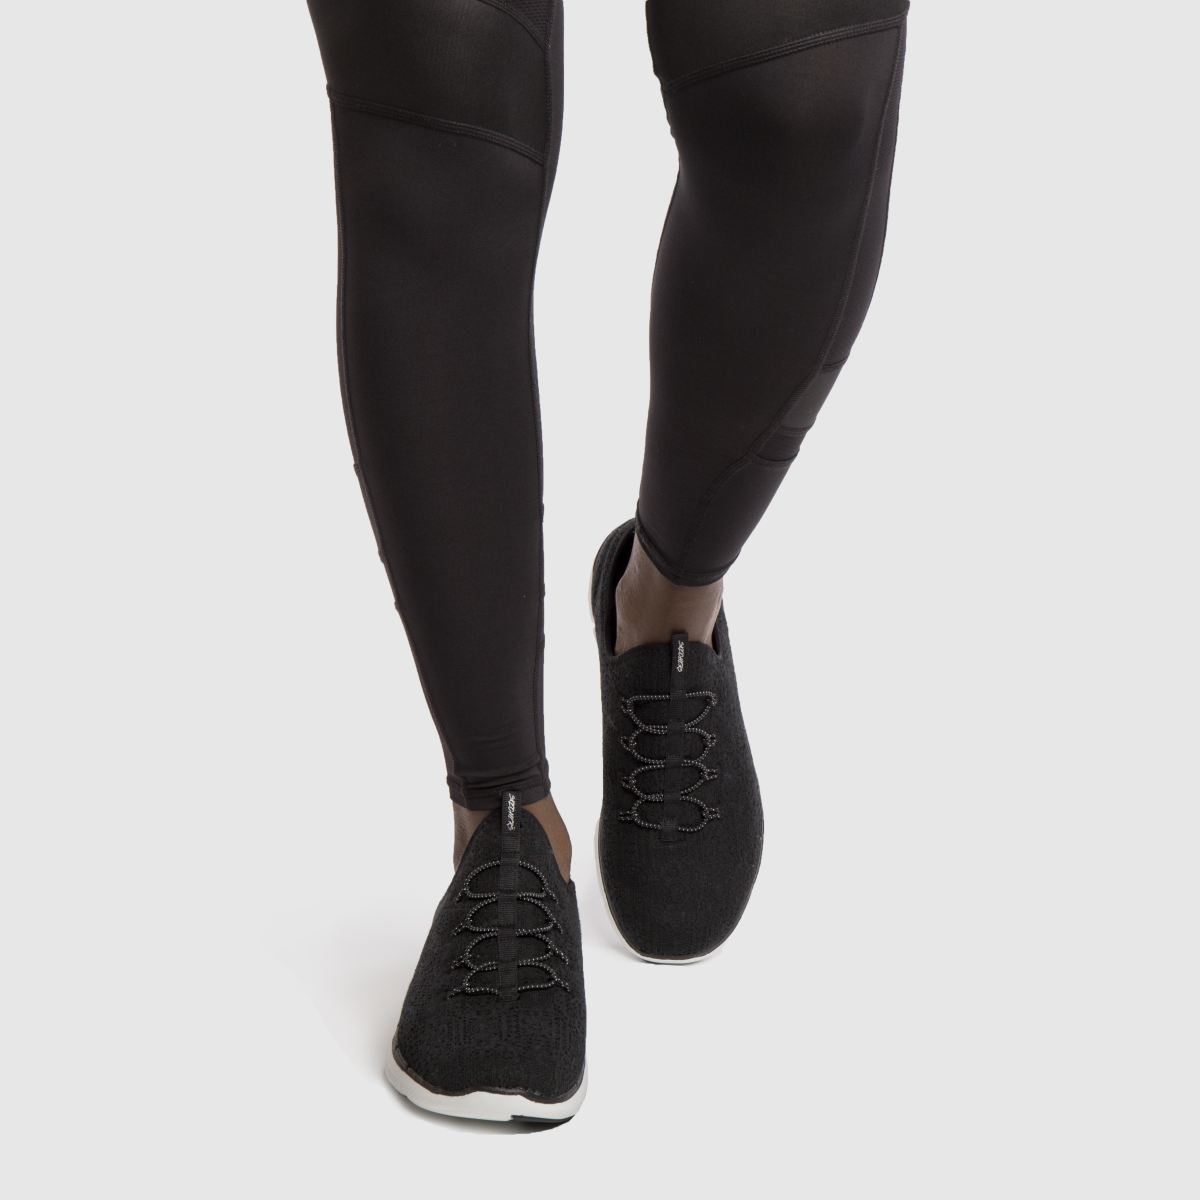 Damen Schwarz-weiß skechers Flex Appeal 2.0 Clear Cut Sneaker | schuh Gute Qualität beliebte Schuhe